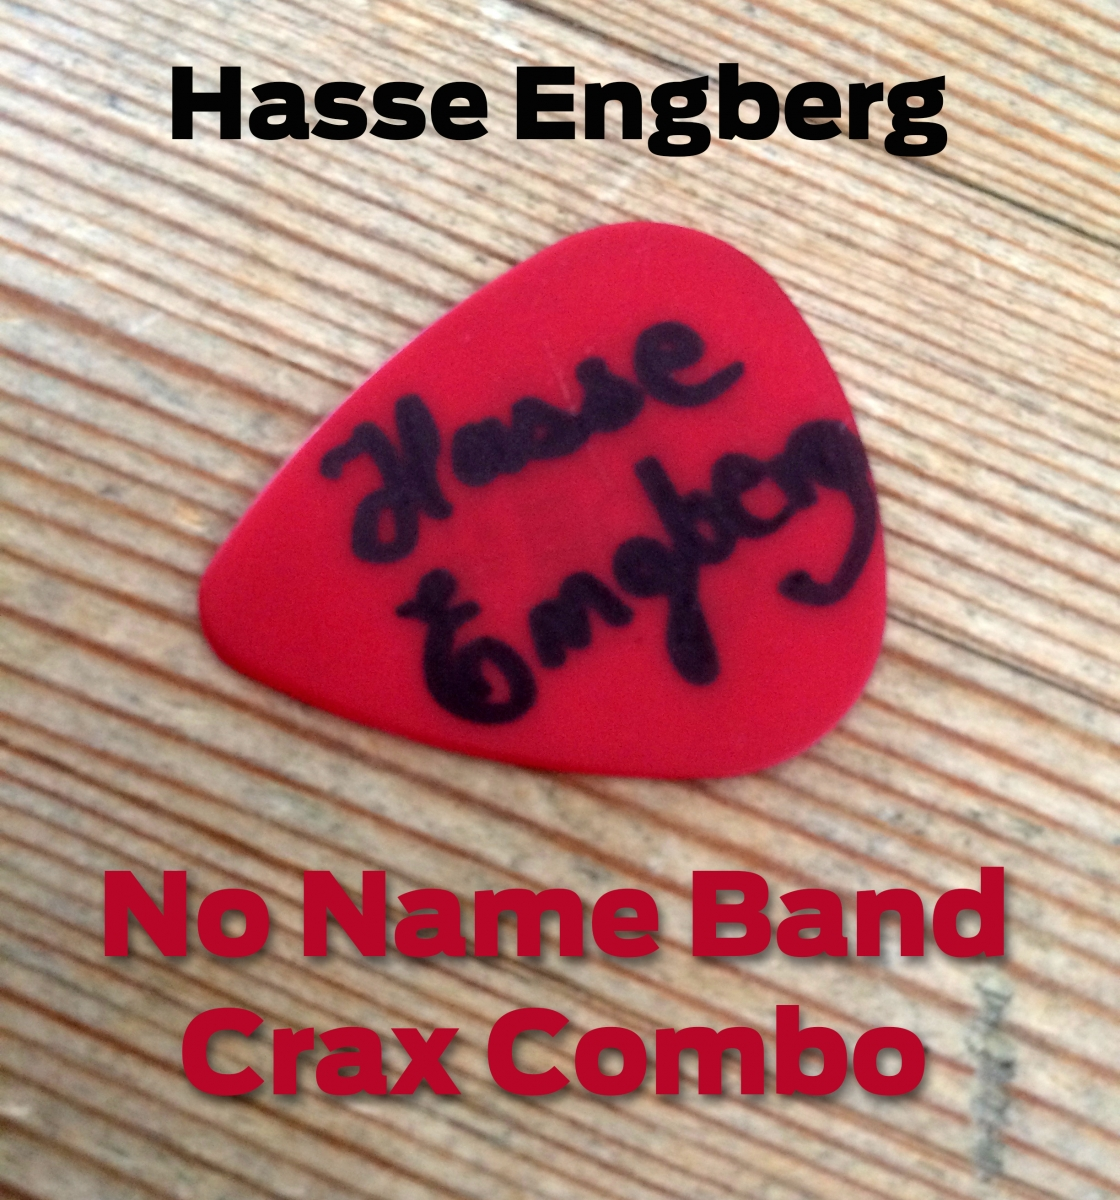 Hasse Engberg